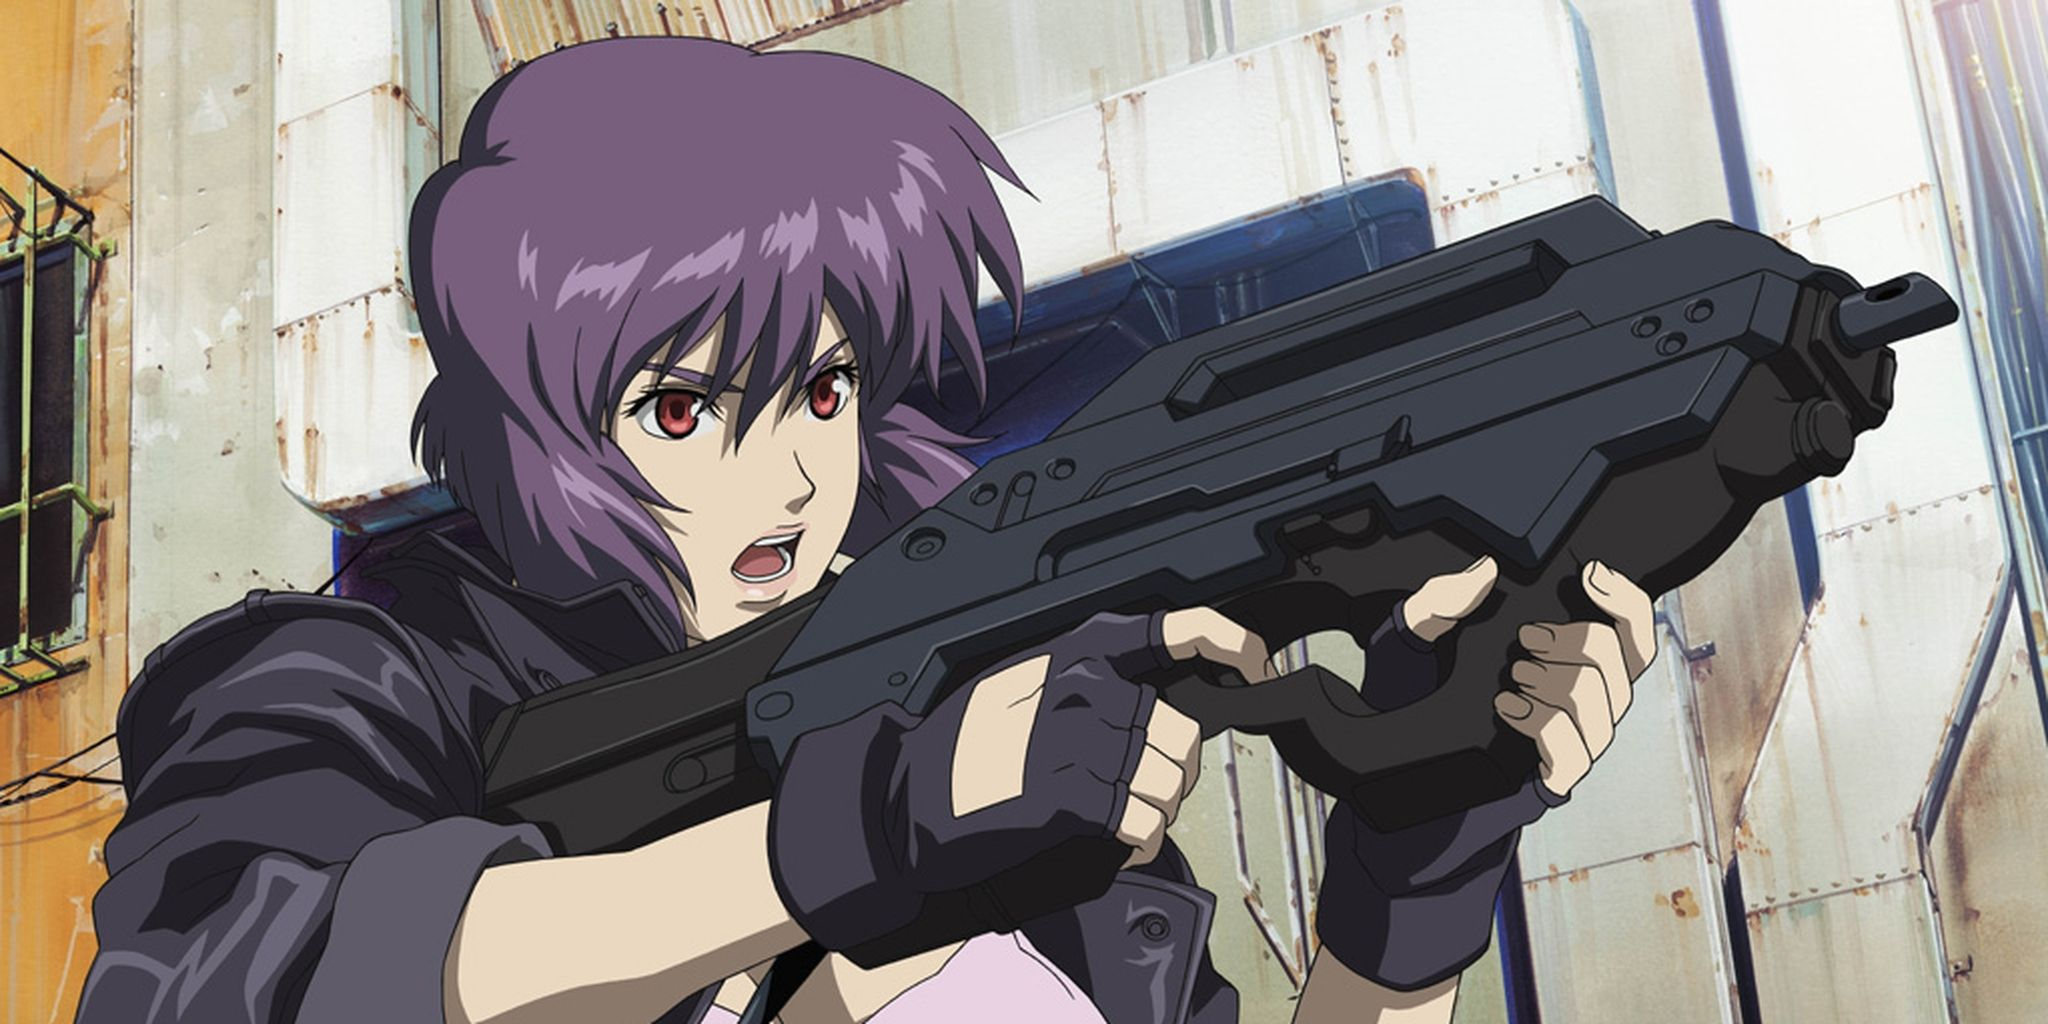 Motoko kusanagi ghost in the shell anime hd anime